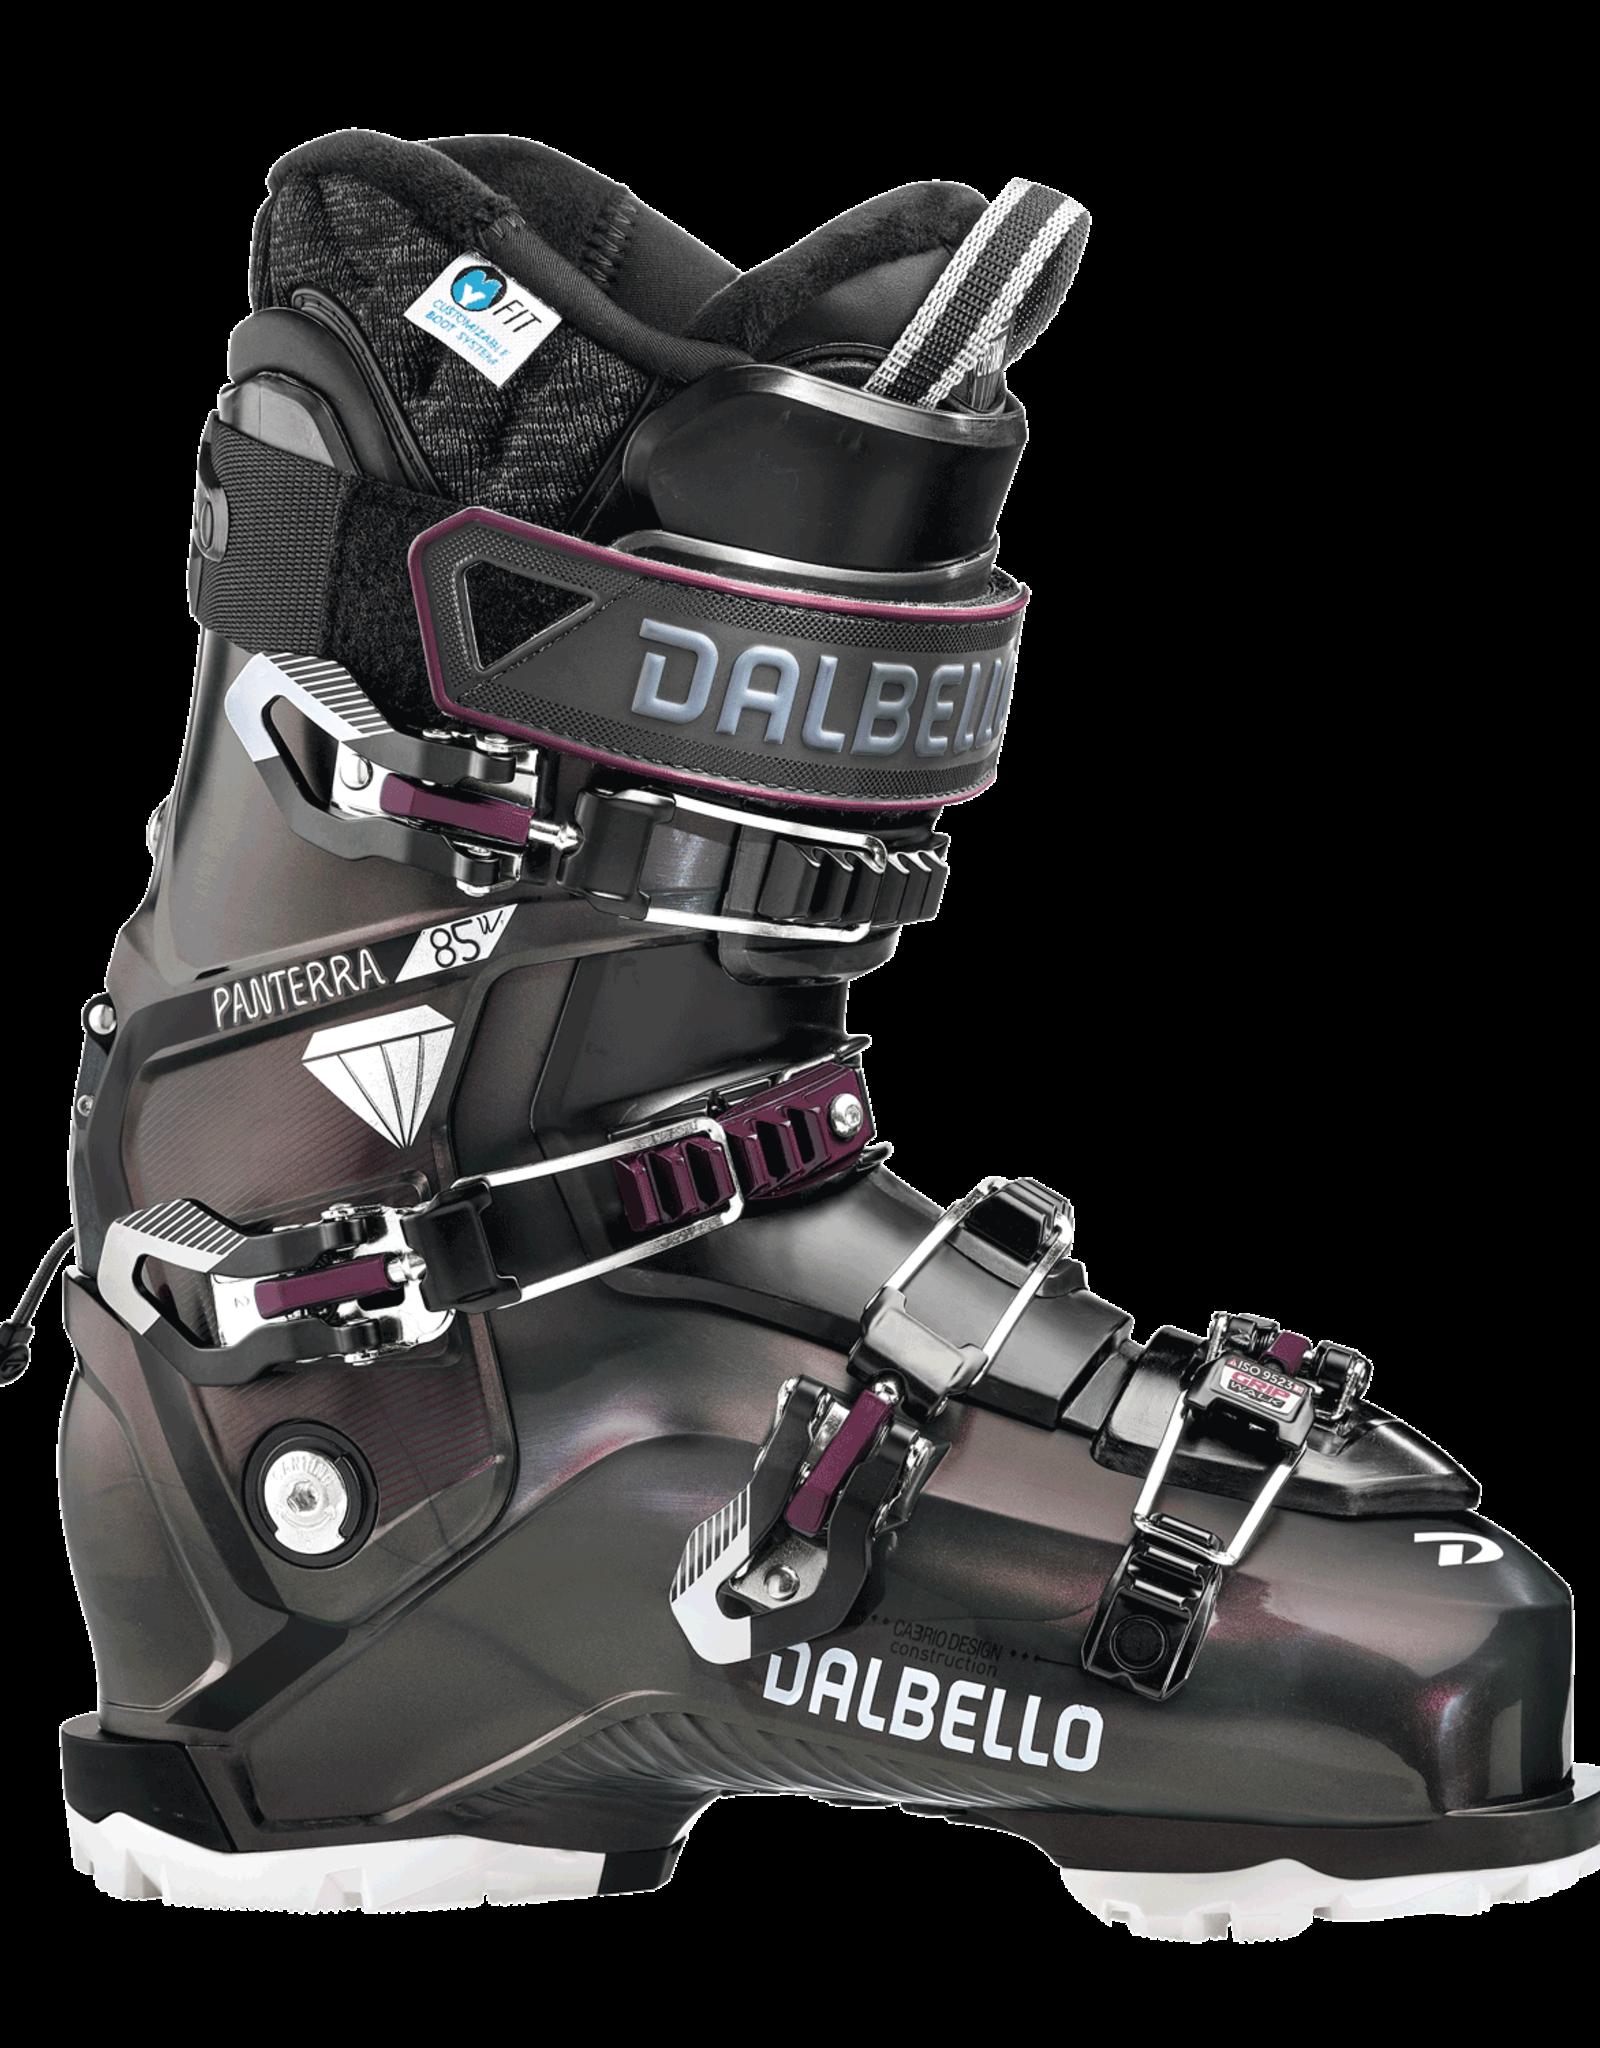 DALBELLO DALBELLO Ski Boots PANTERRA 85 W GW (20/21)